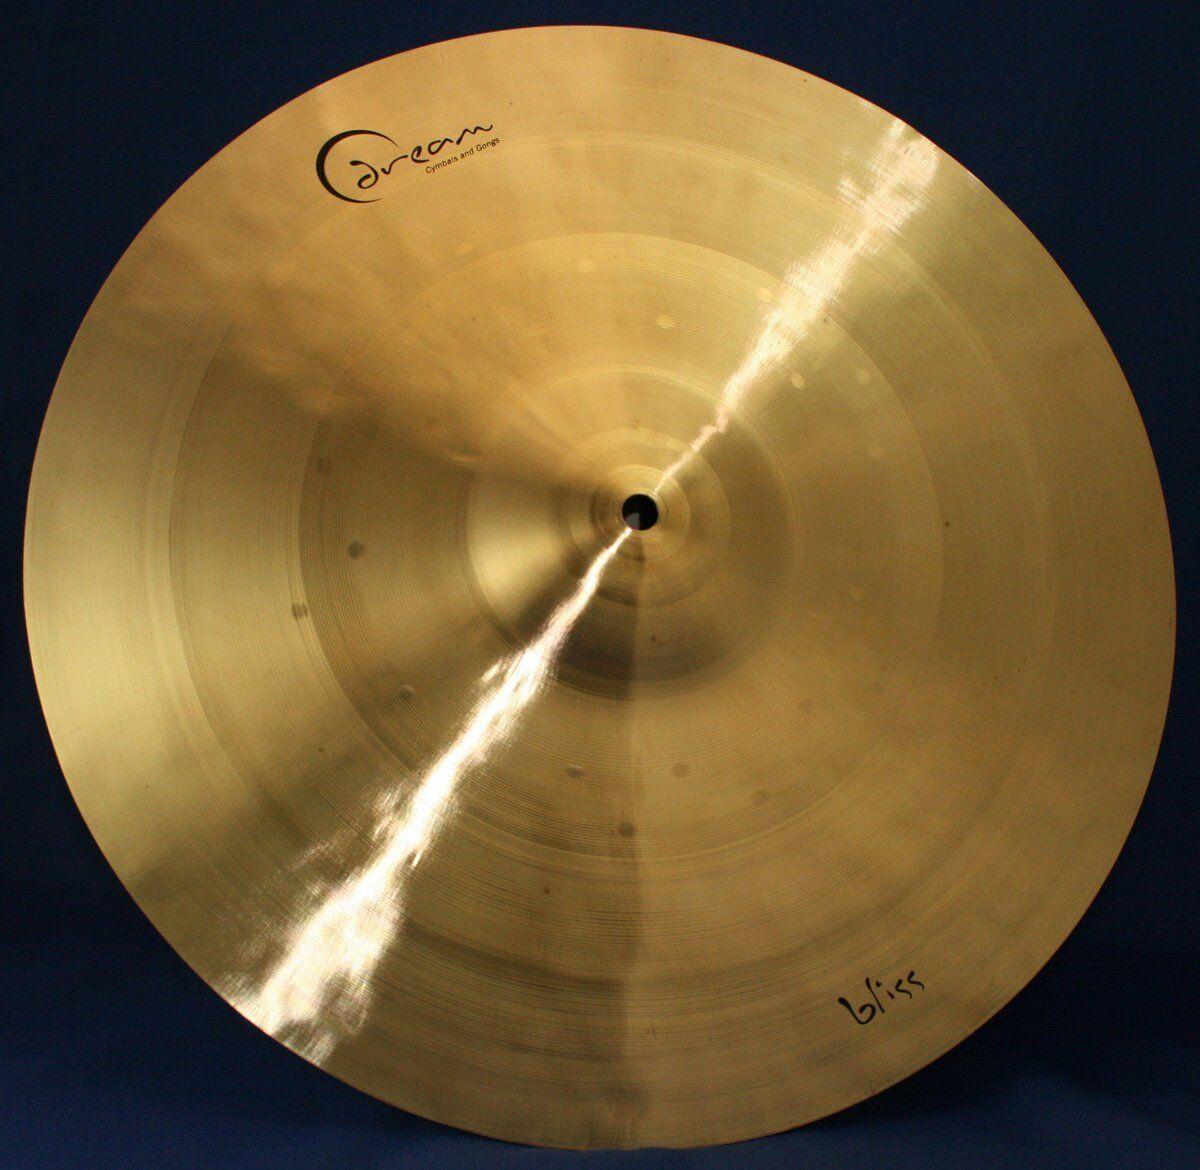 Dream Cymbals BCRRI19 Bliss 19  Crash Ride Cymbal NEW + FREE 2 DAY SHIPPING